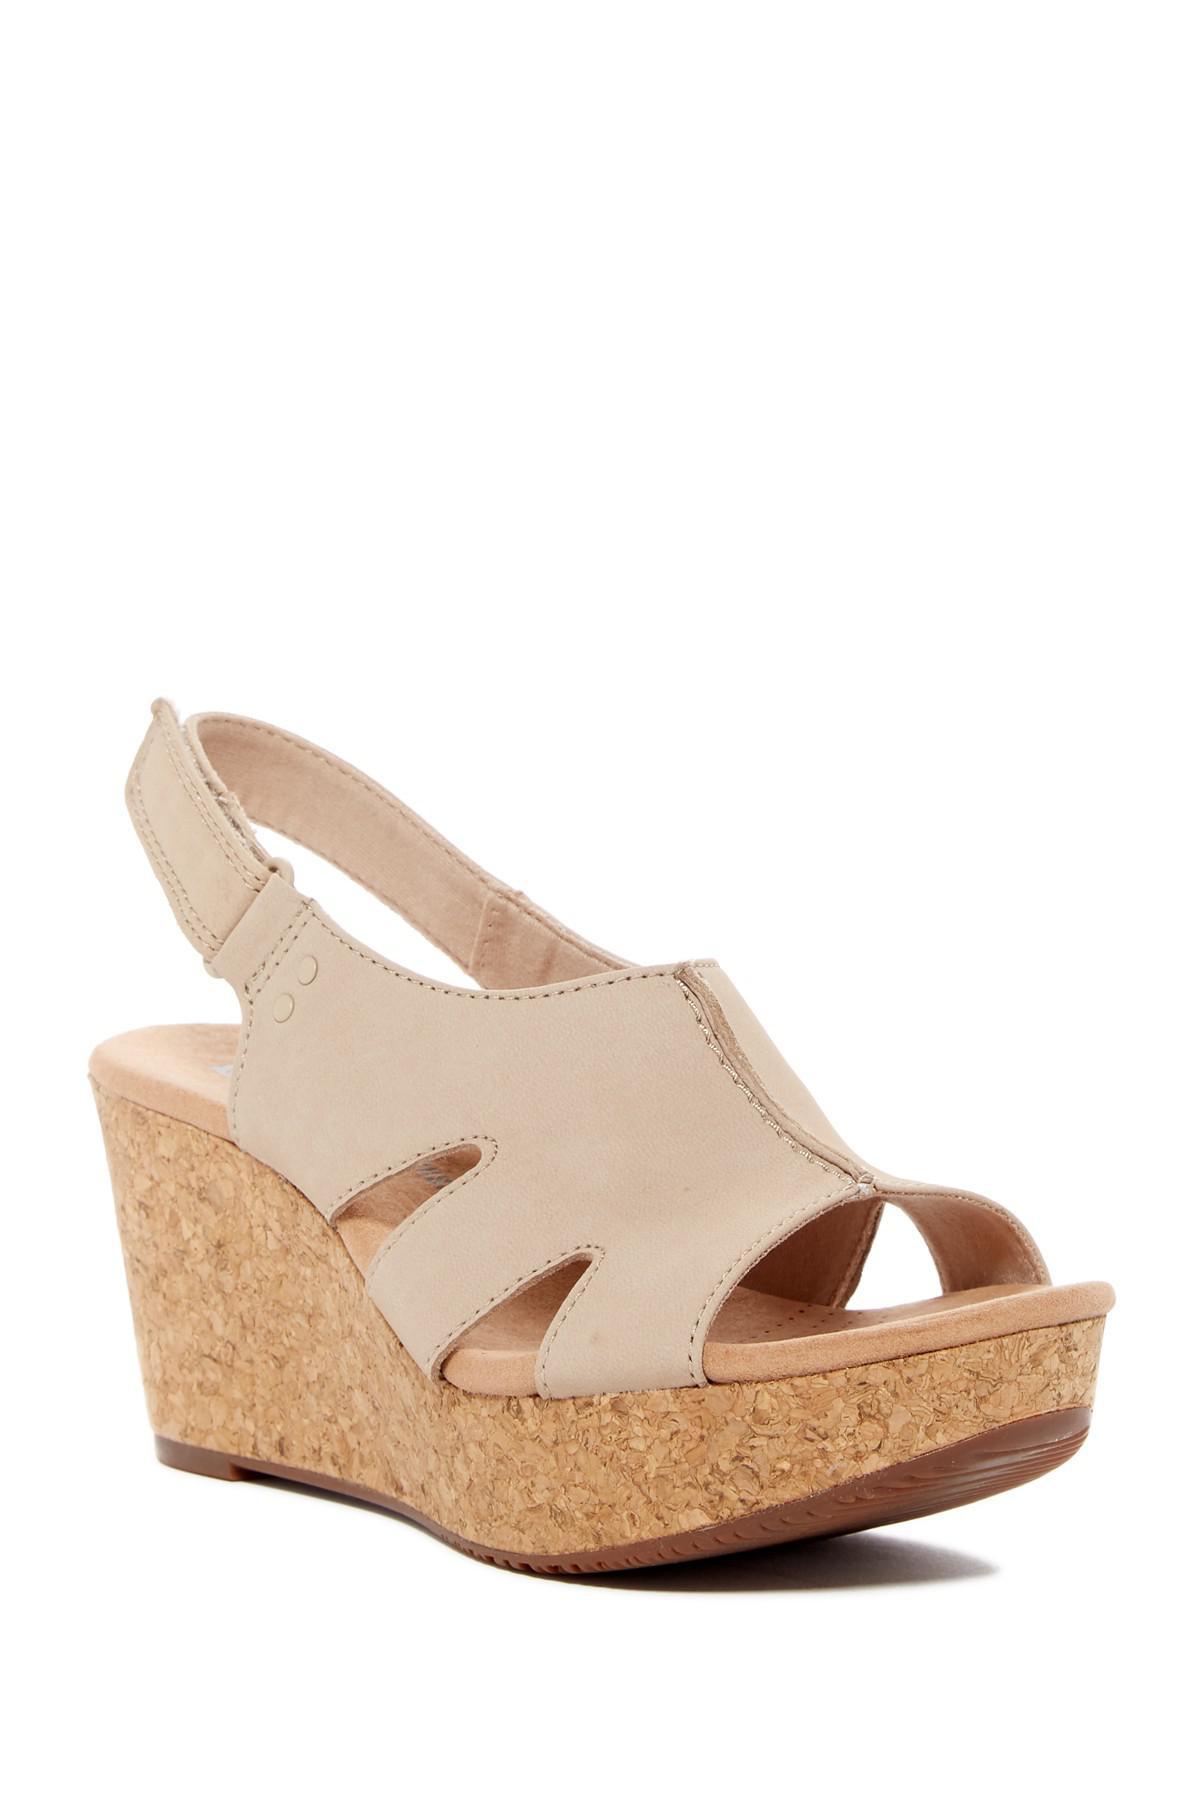 7dc4630fded Lyst - Clarks Annadel Bari Leather Platform Wedge Sandal in Natural